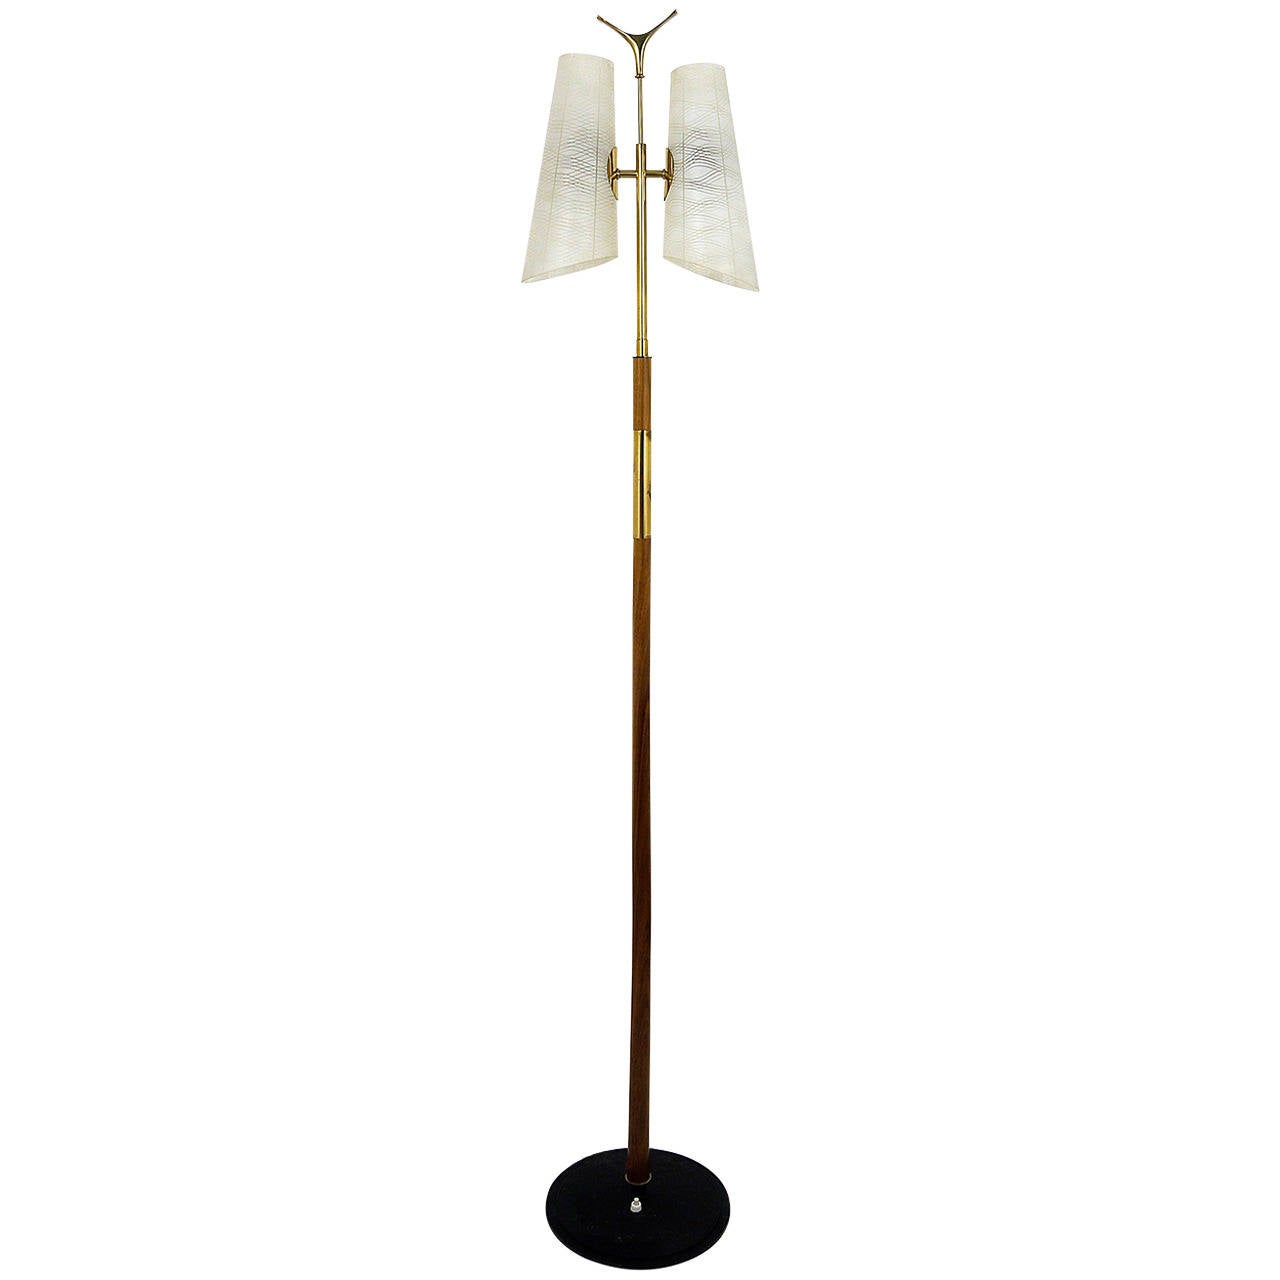 A Charming Rupert Nikoll Mid-Century Brass Floor Lamp, Austria, 1950s